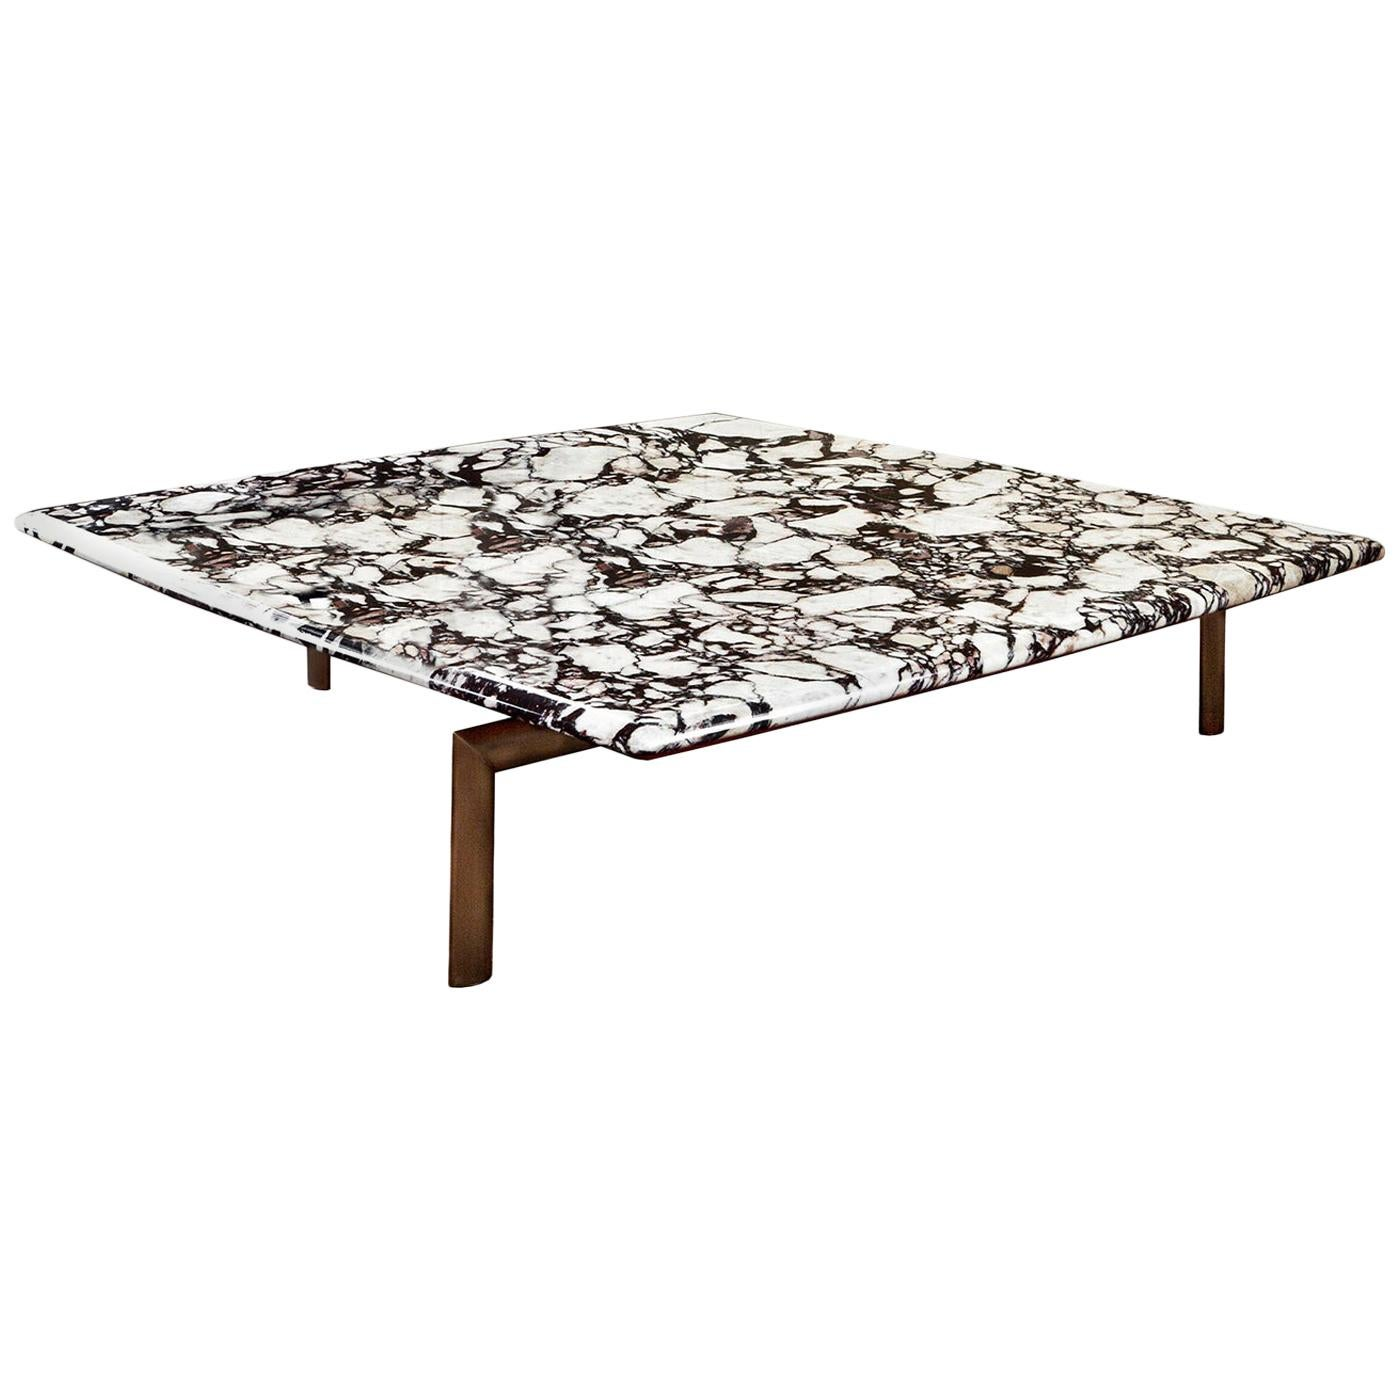 Sasso Breccia Marble Coffee Table by Bosco Fair